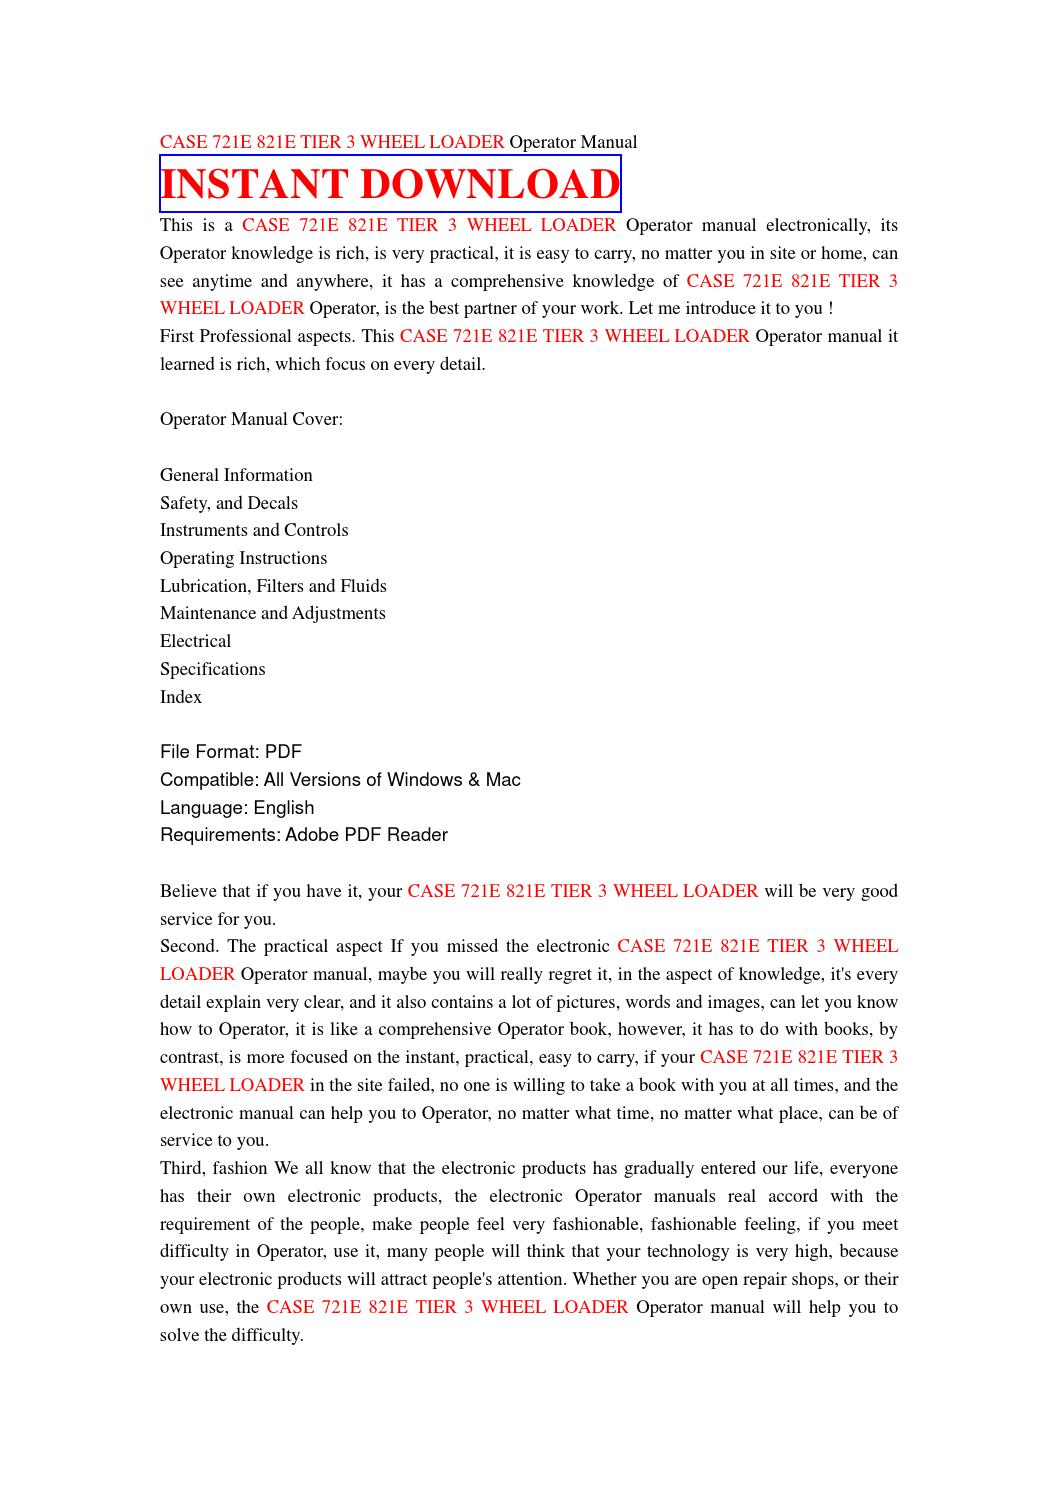 Case 721e 821e tier 3 wheel loader operator manual by